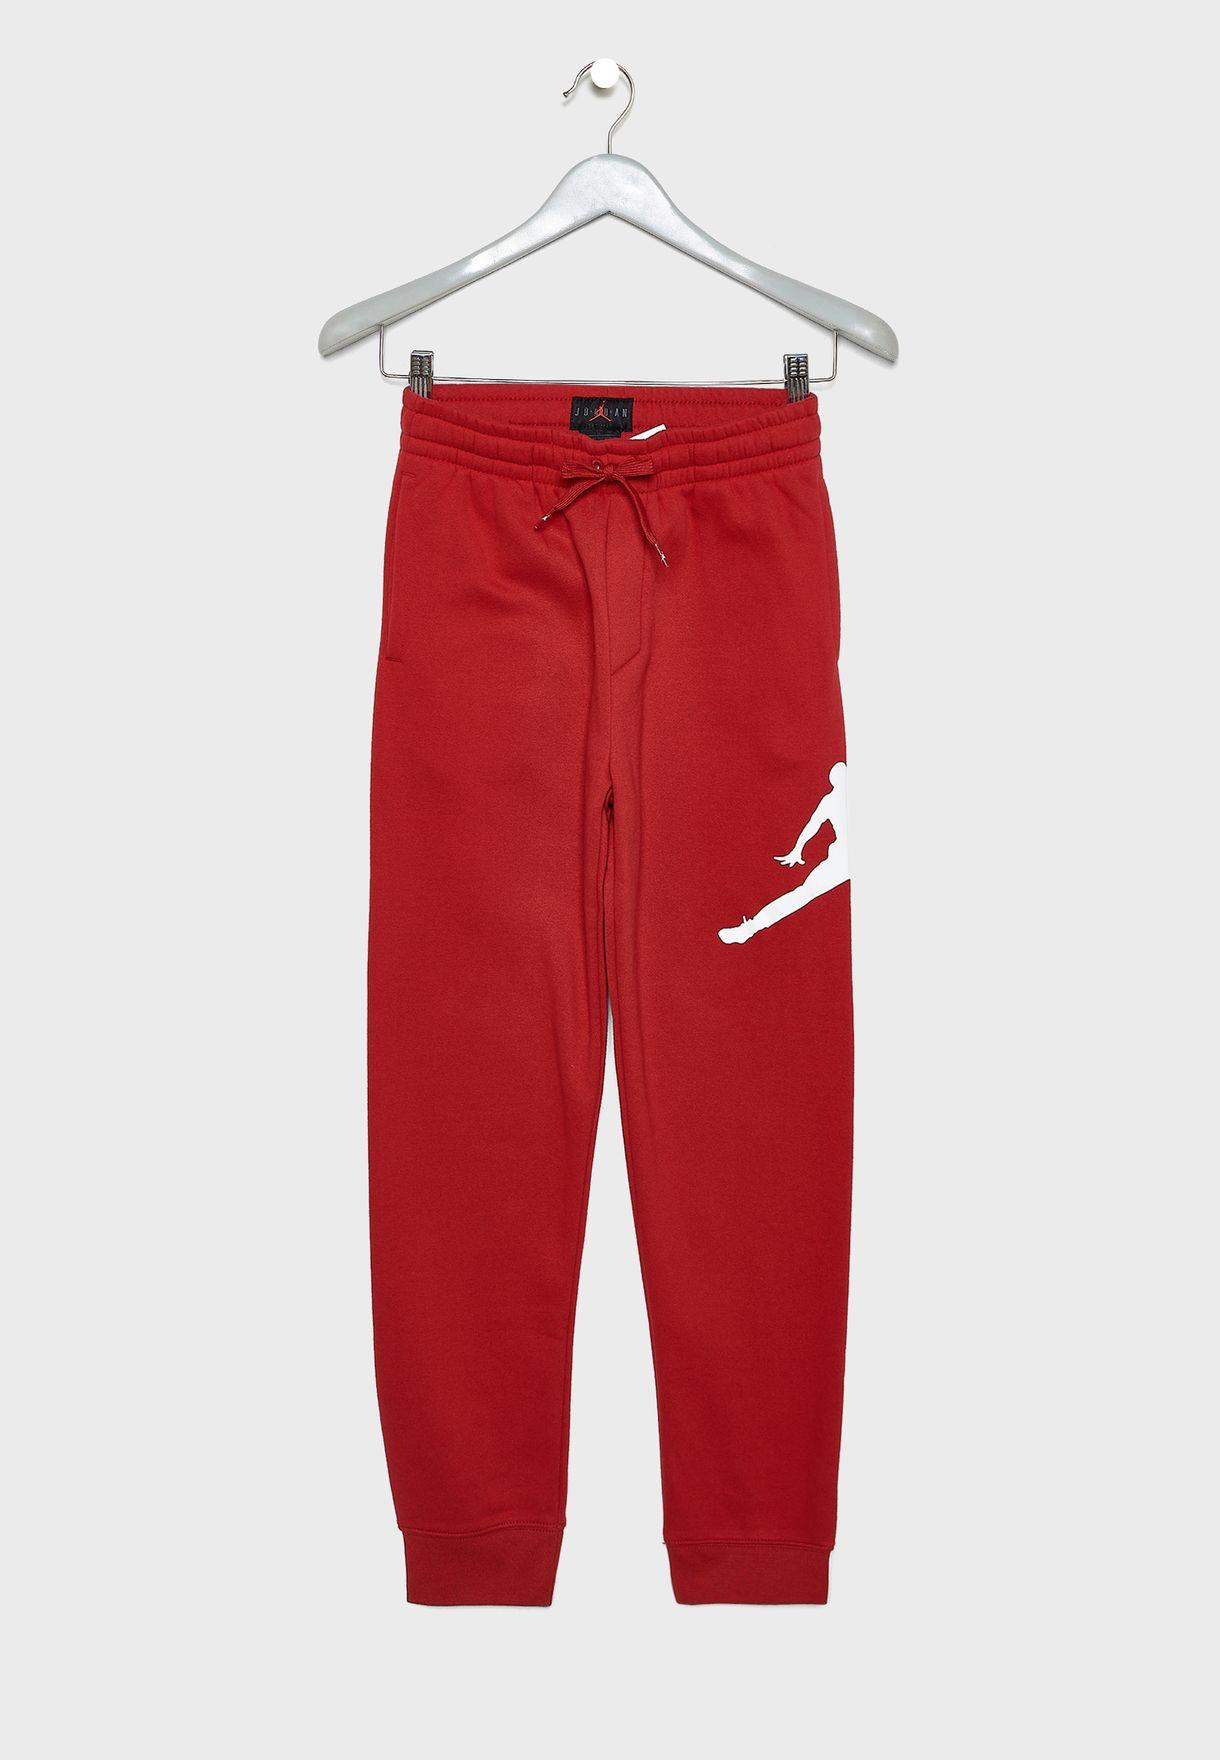 Buy Nike red Youth Jordan Jumpman Logo